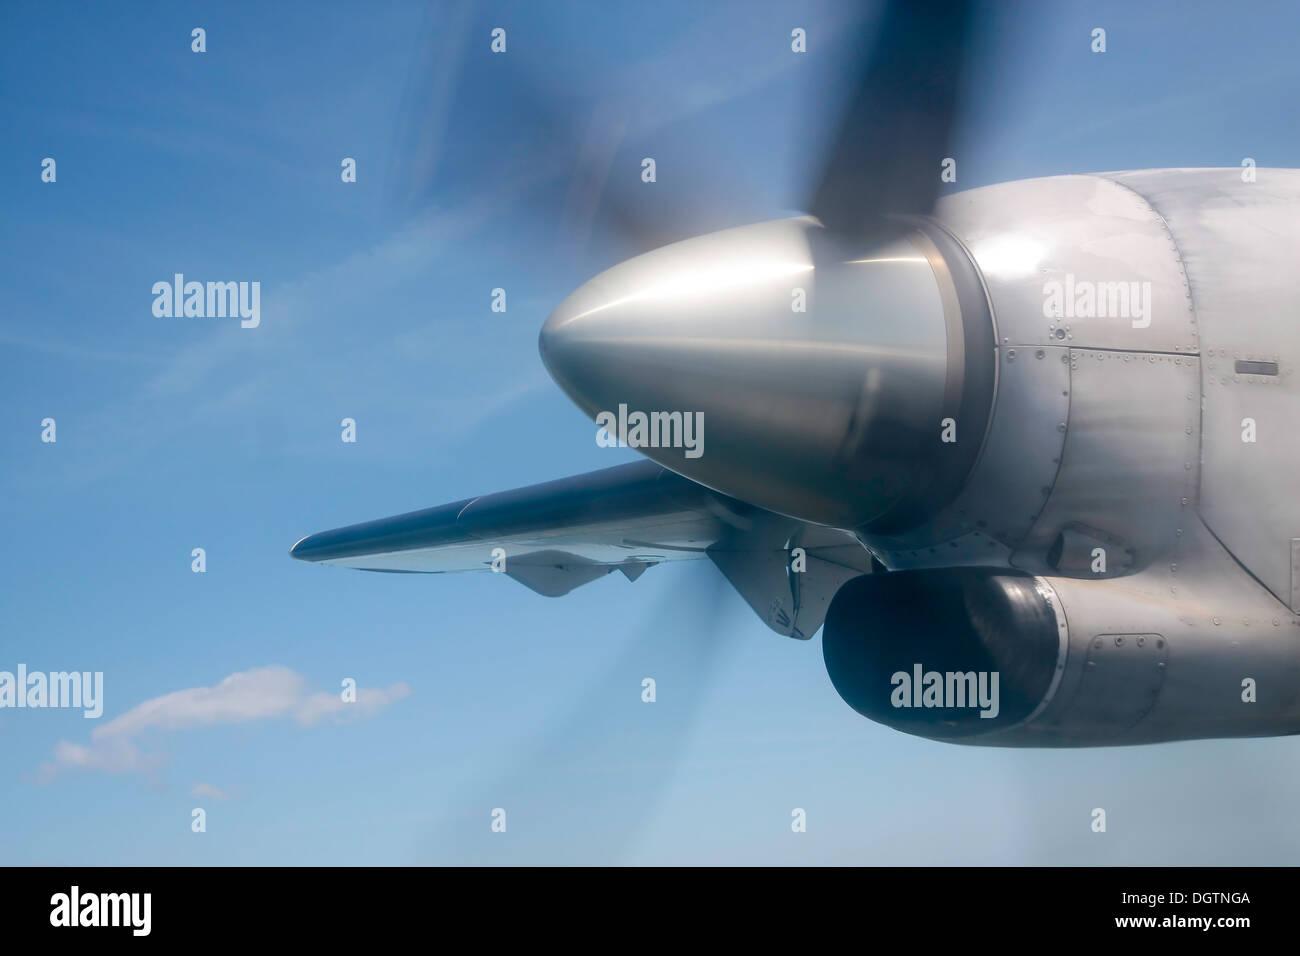 Ausführung Silber Propeller vor blauem Himmel Stockbild